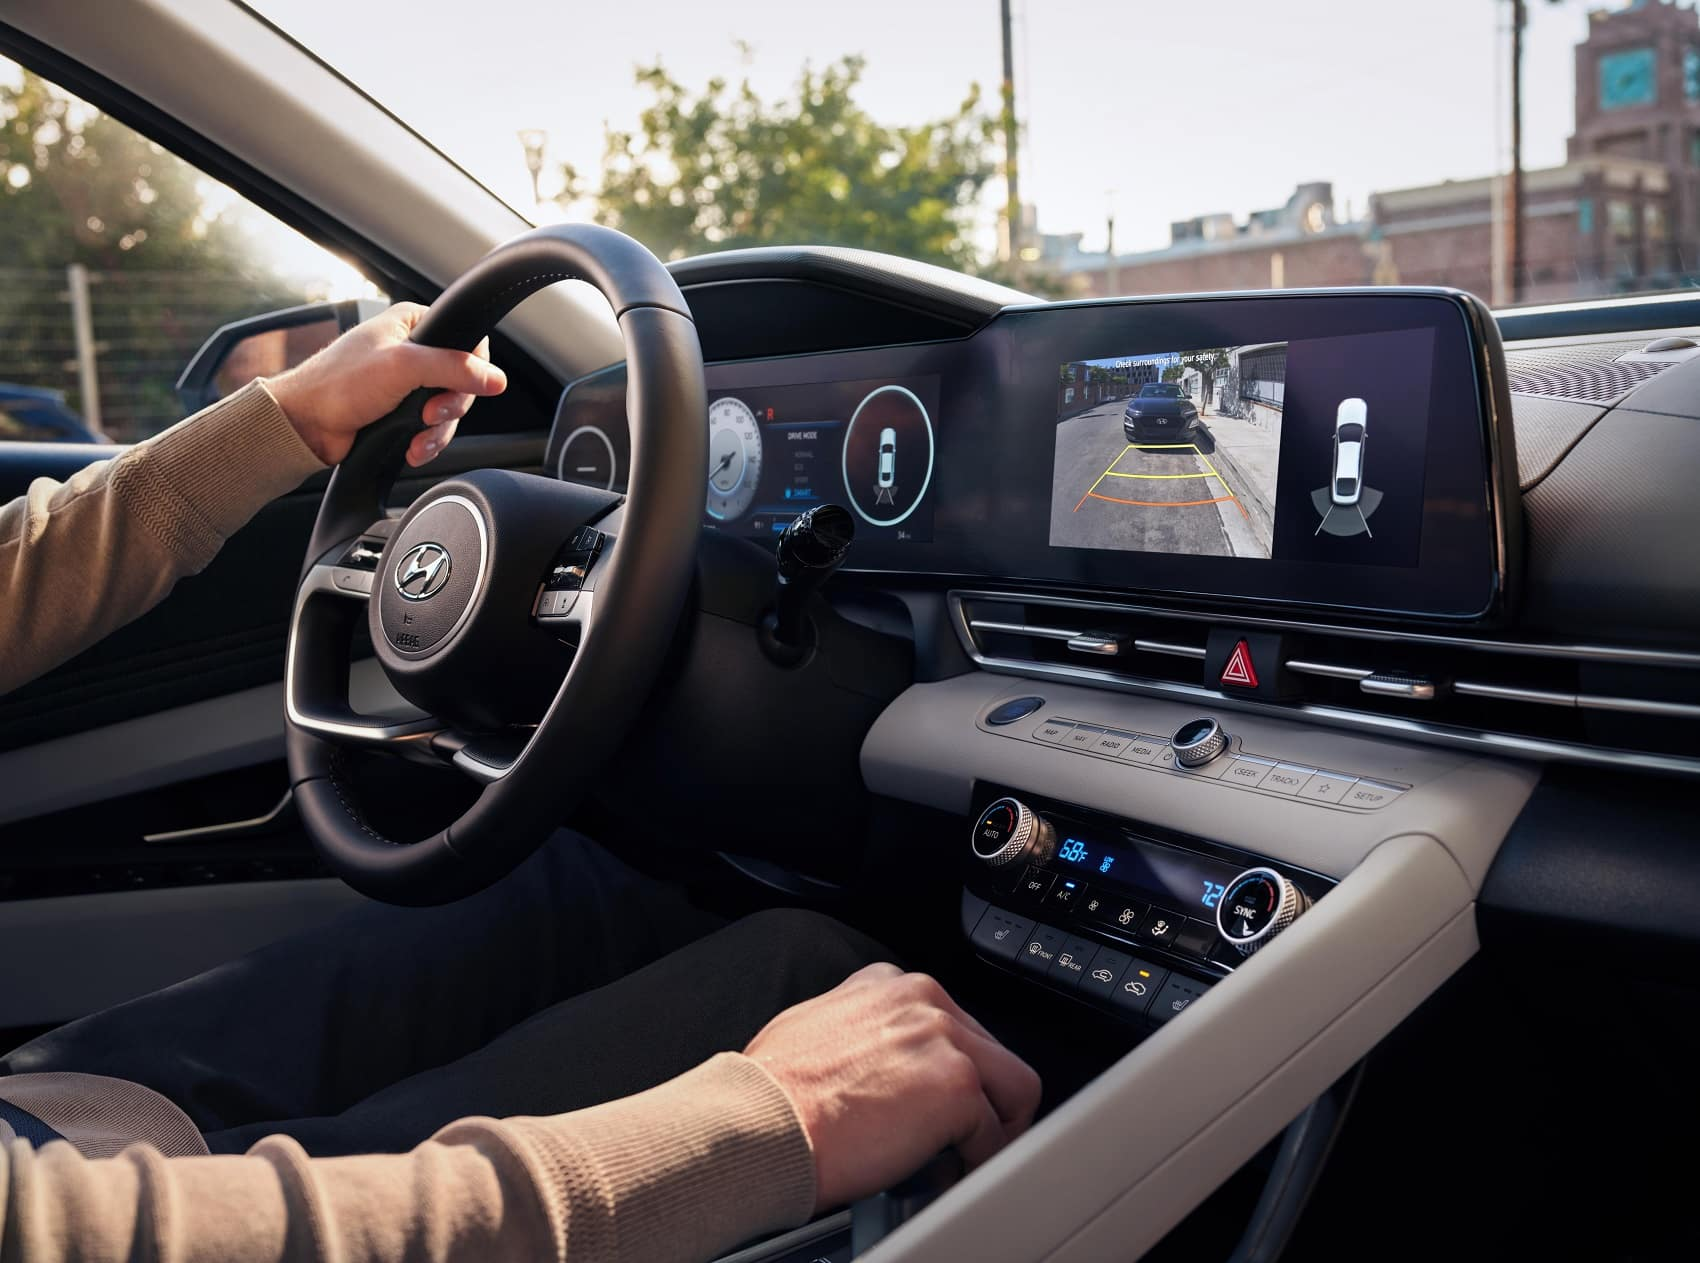 2021 Hyundai Elantra Interior Technology